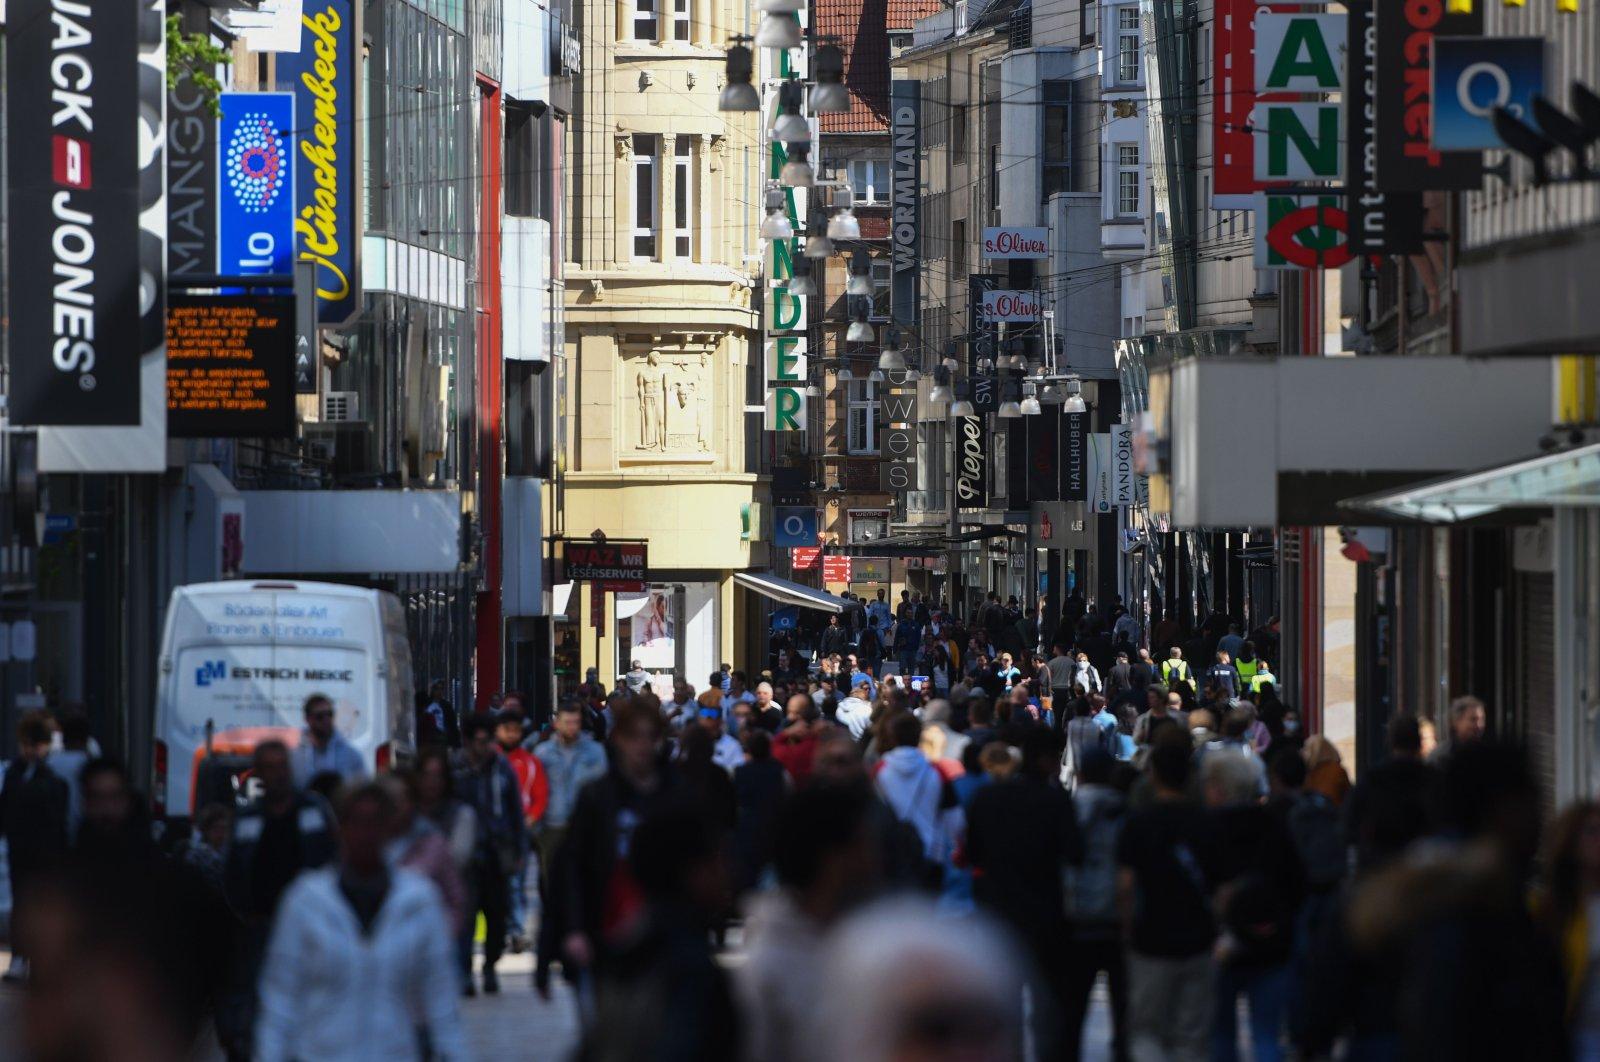 People walk past shops on a pedestrian street in Dortmund, western Germany, April 20, 2020. (AFP Photo)